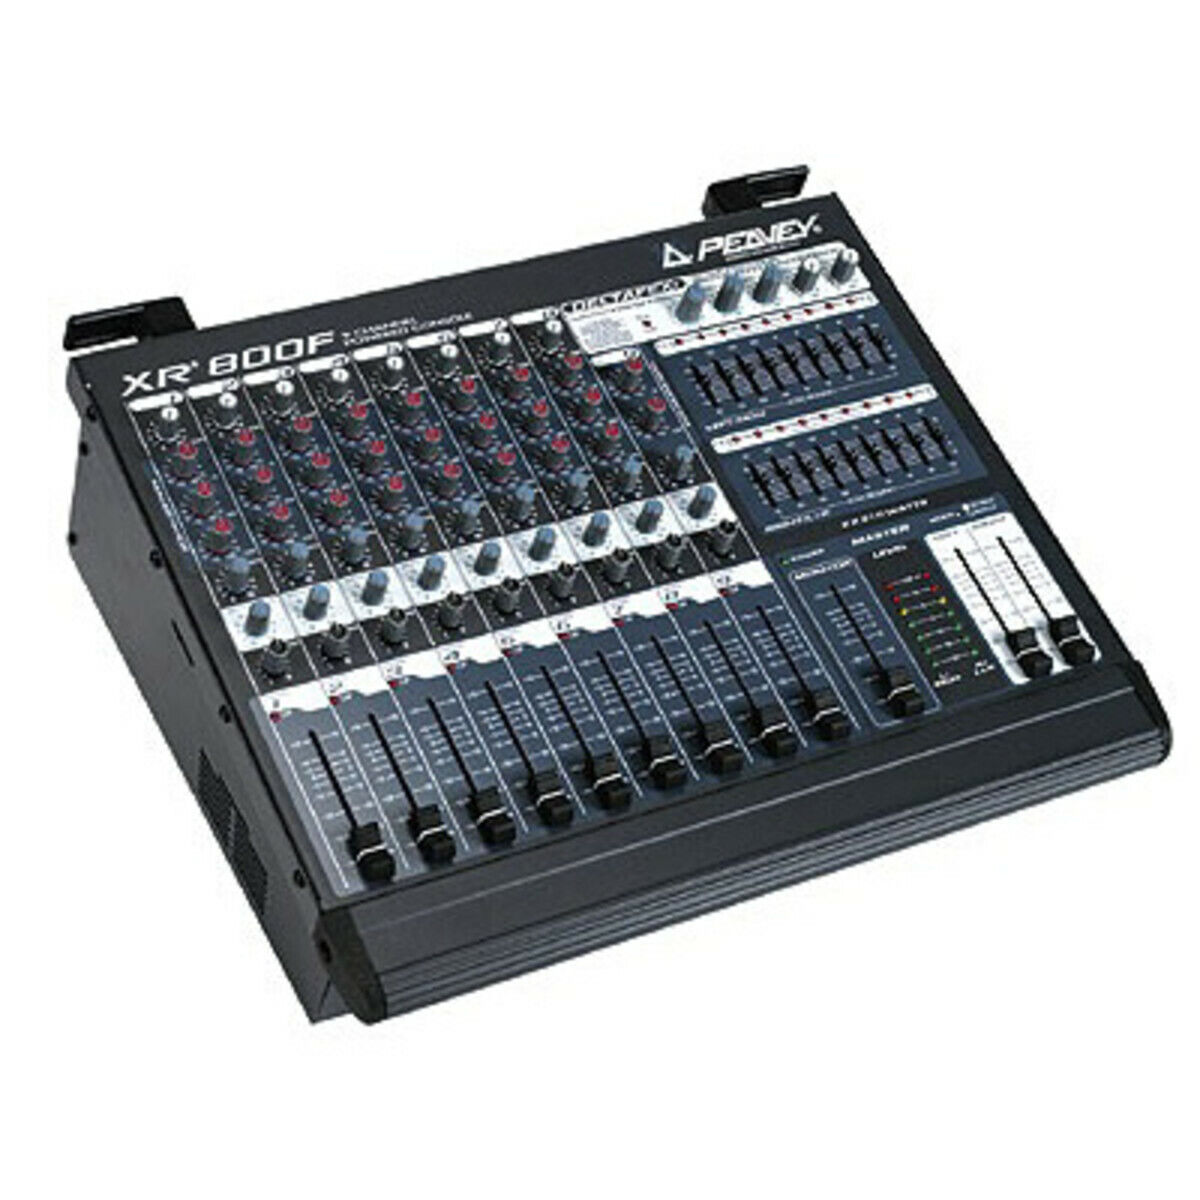 Table de mixage peavey xr-800f - 9 channels  2x110 w analogique  old stock